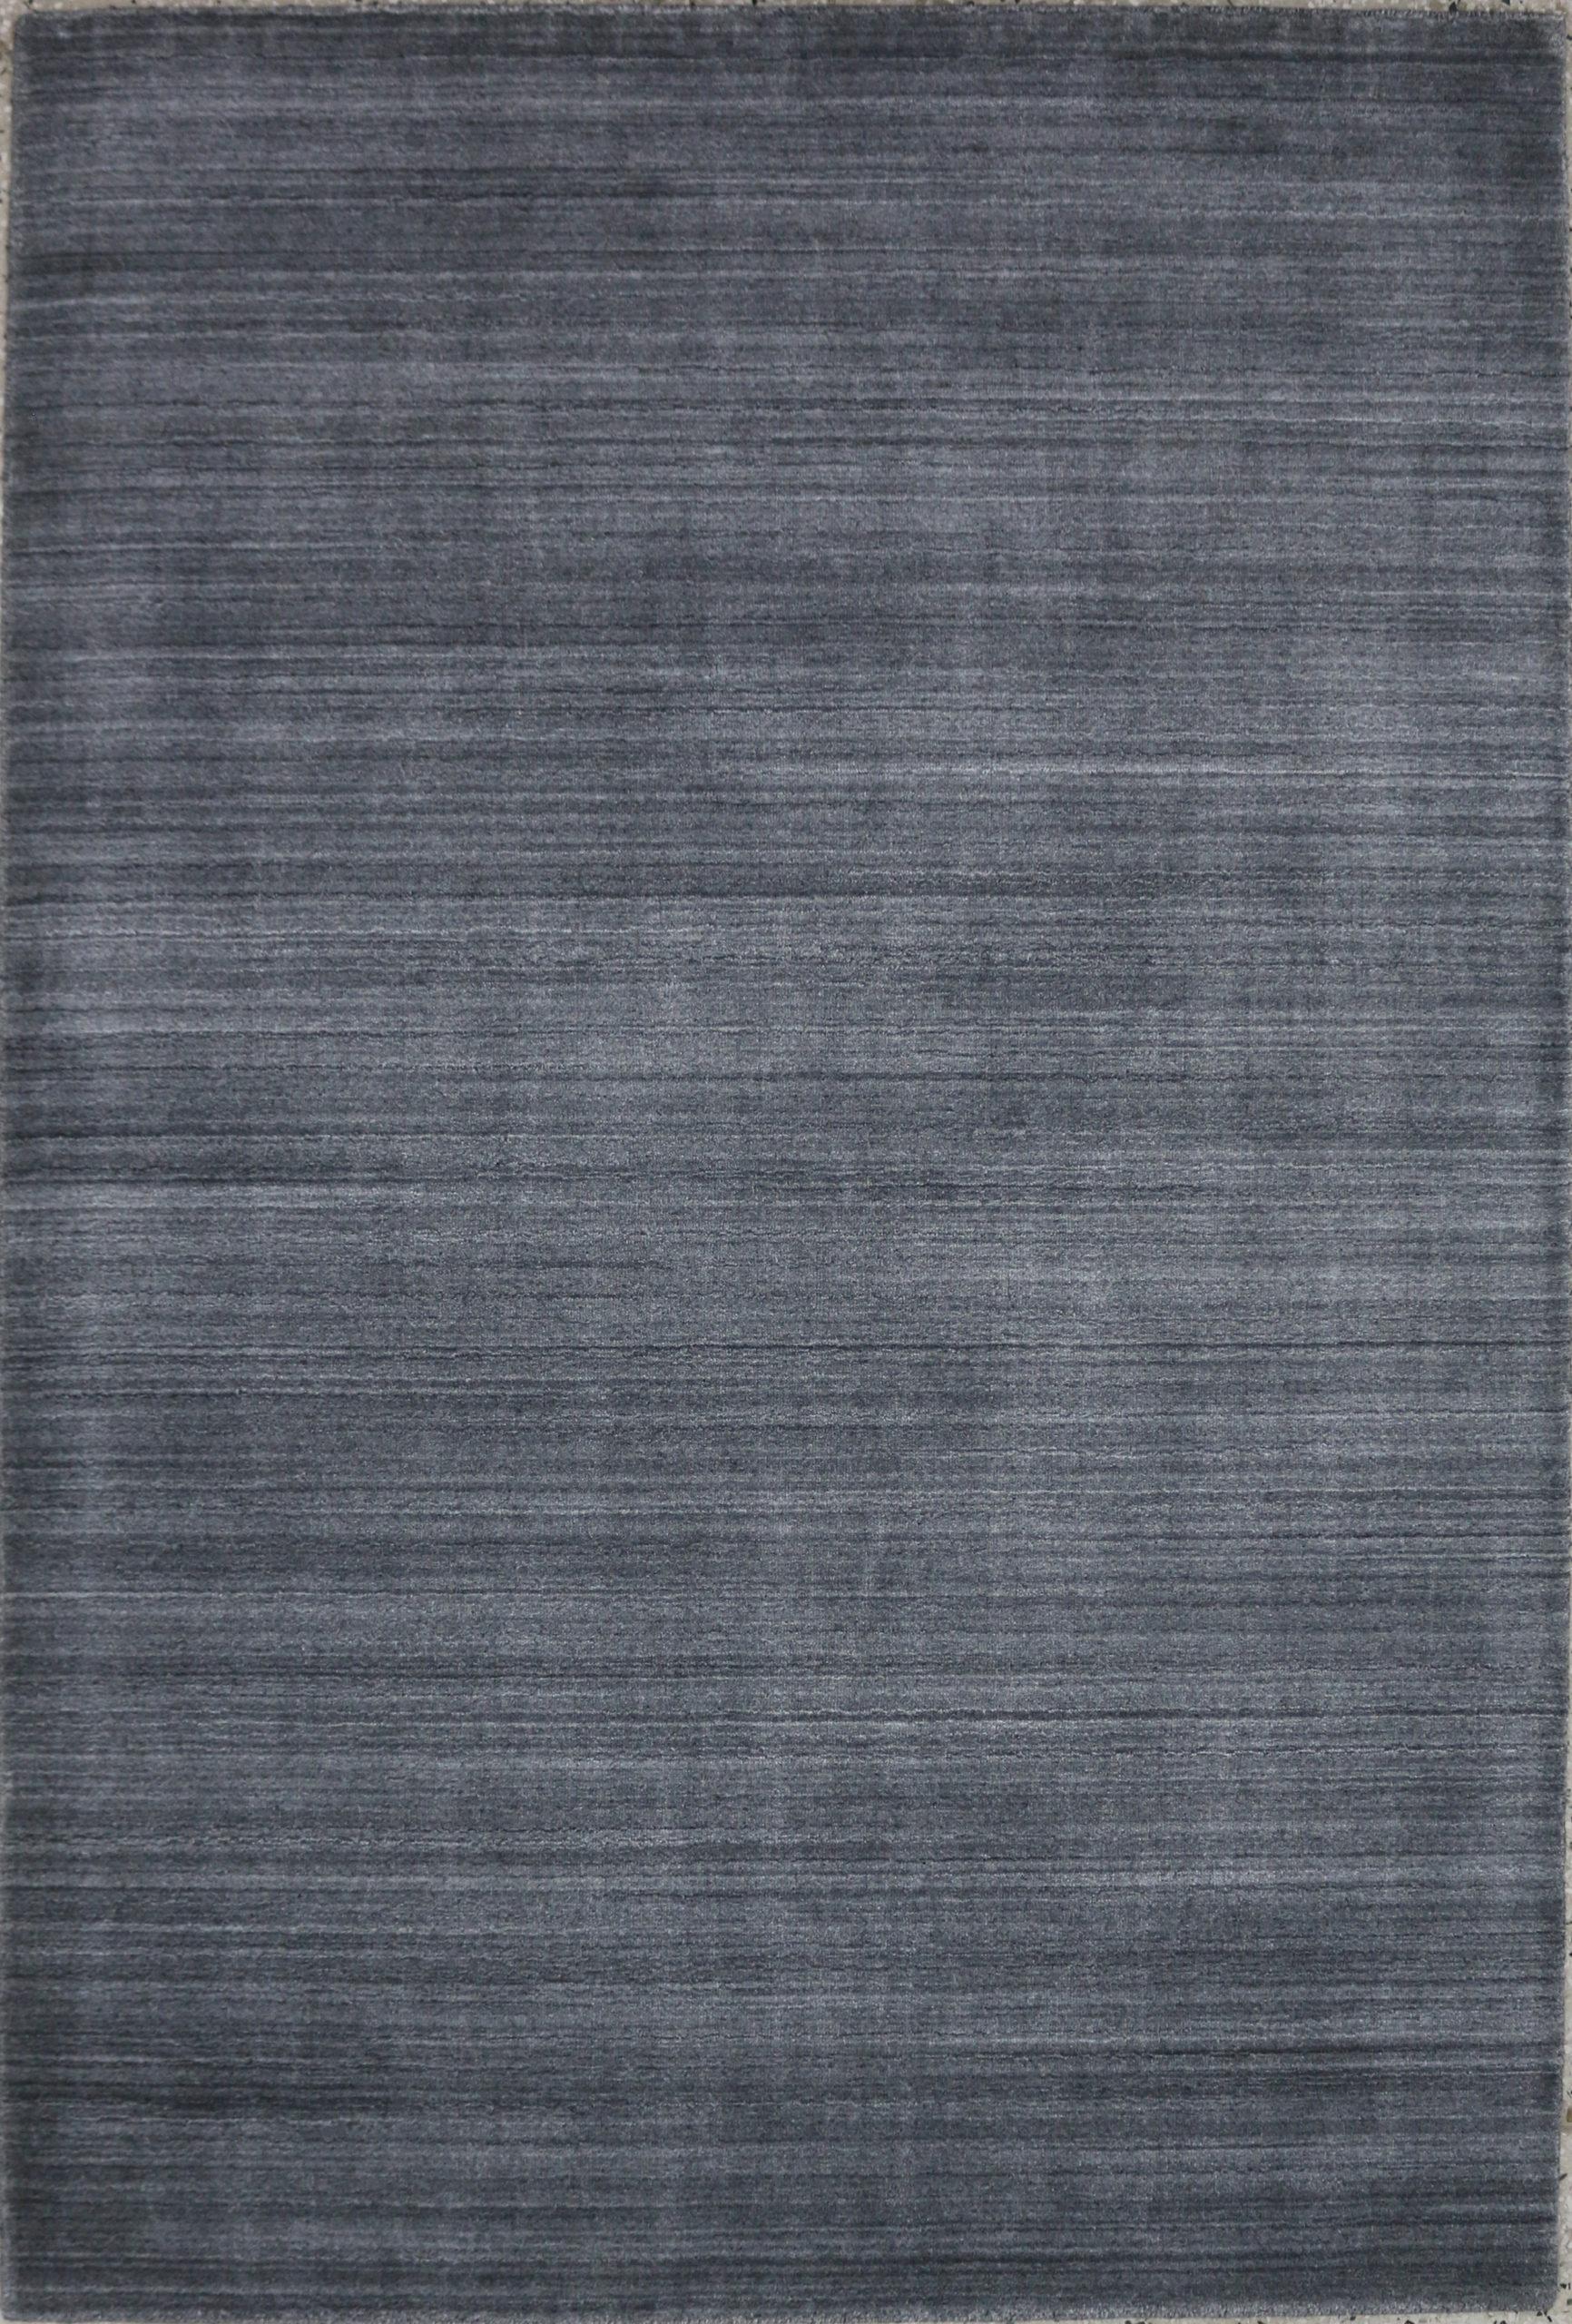 LU-187 Charcoal (1)